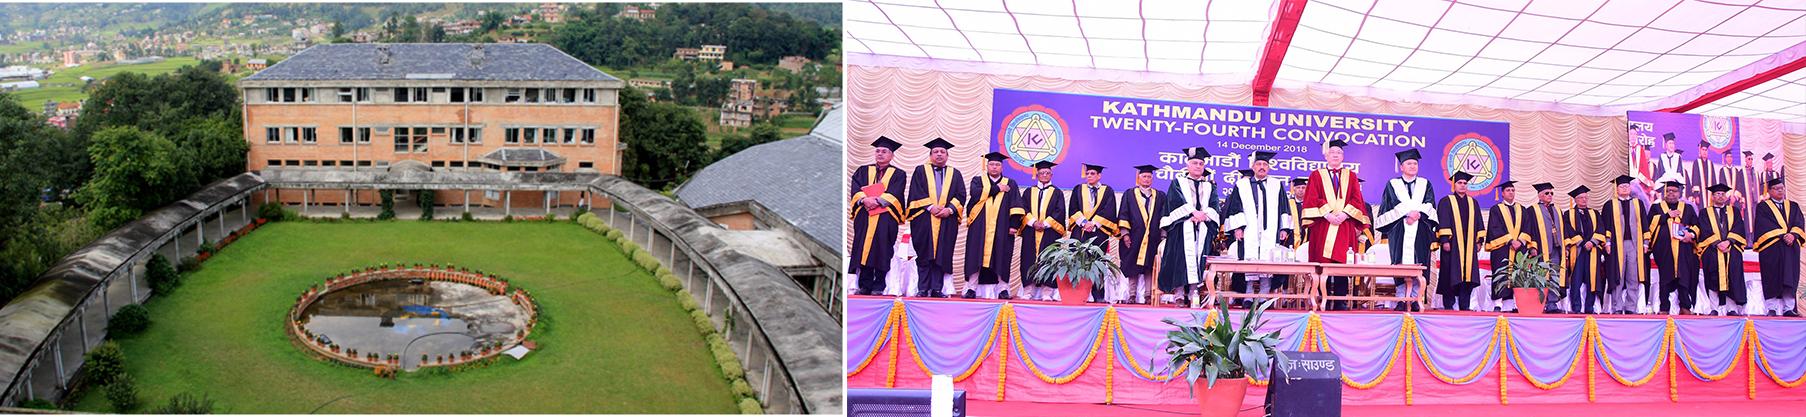 Kathmandu University School of Science